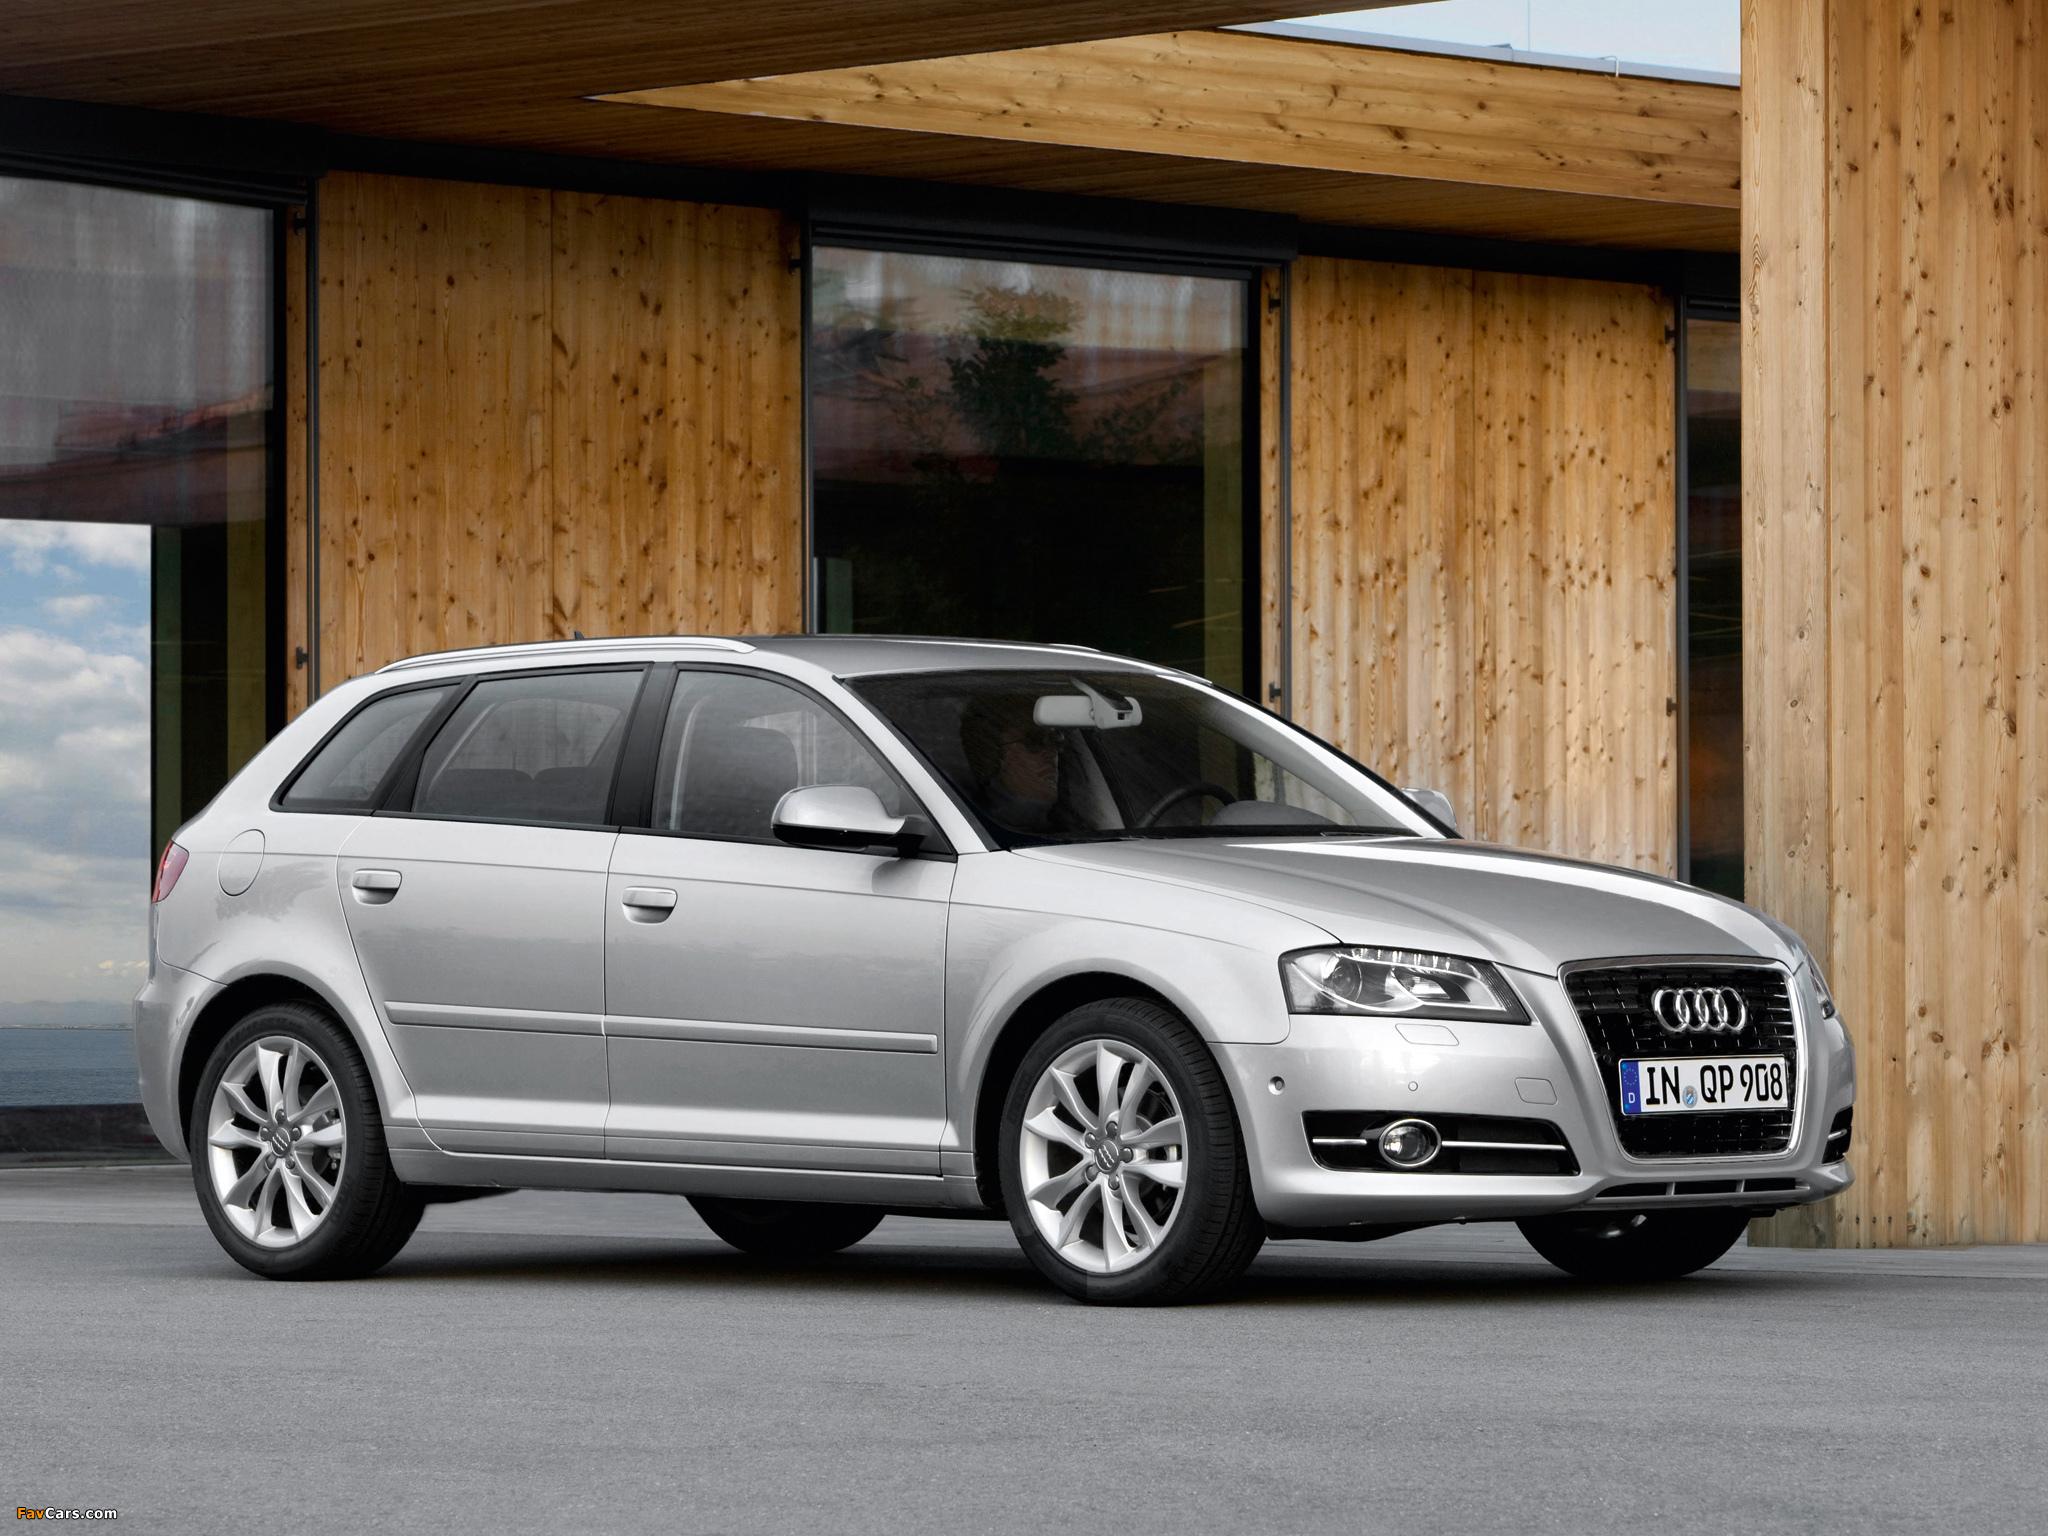 Audi A 3 2010 >> Audi A3 Sportback TFSI 8PA (2010) images (2048x1536)